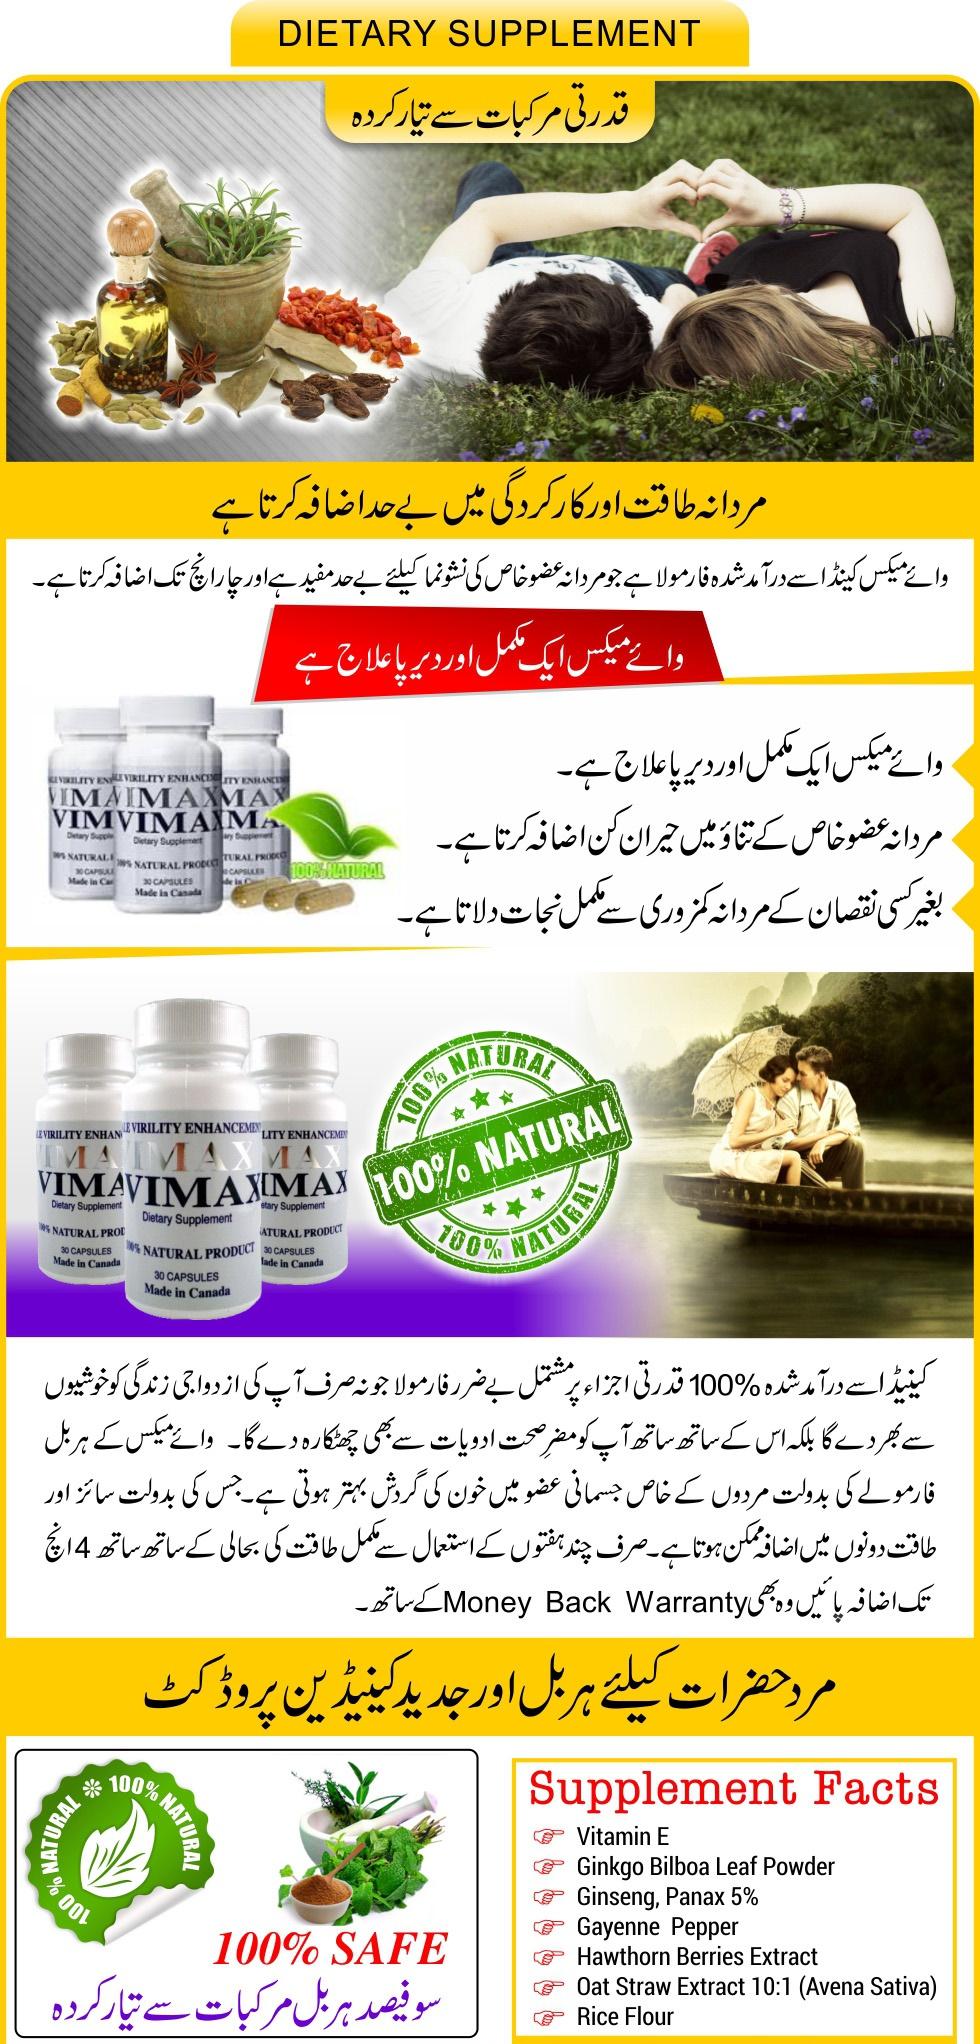 Vimax Vimax in Pakistan, Lahore, Karachi, Islamabad, 03009791333